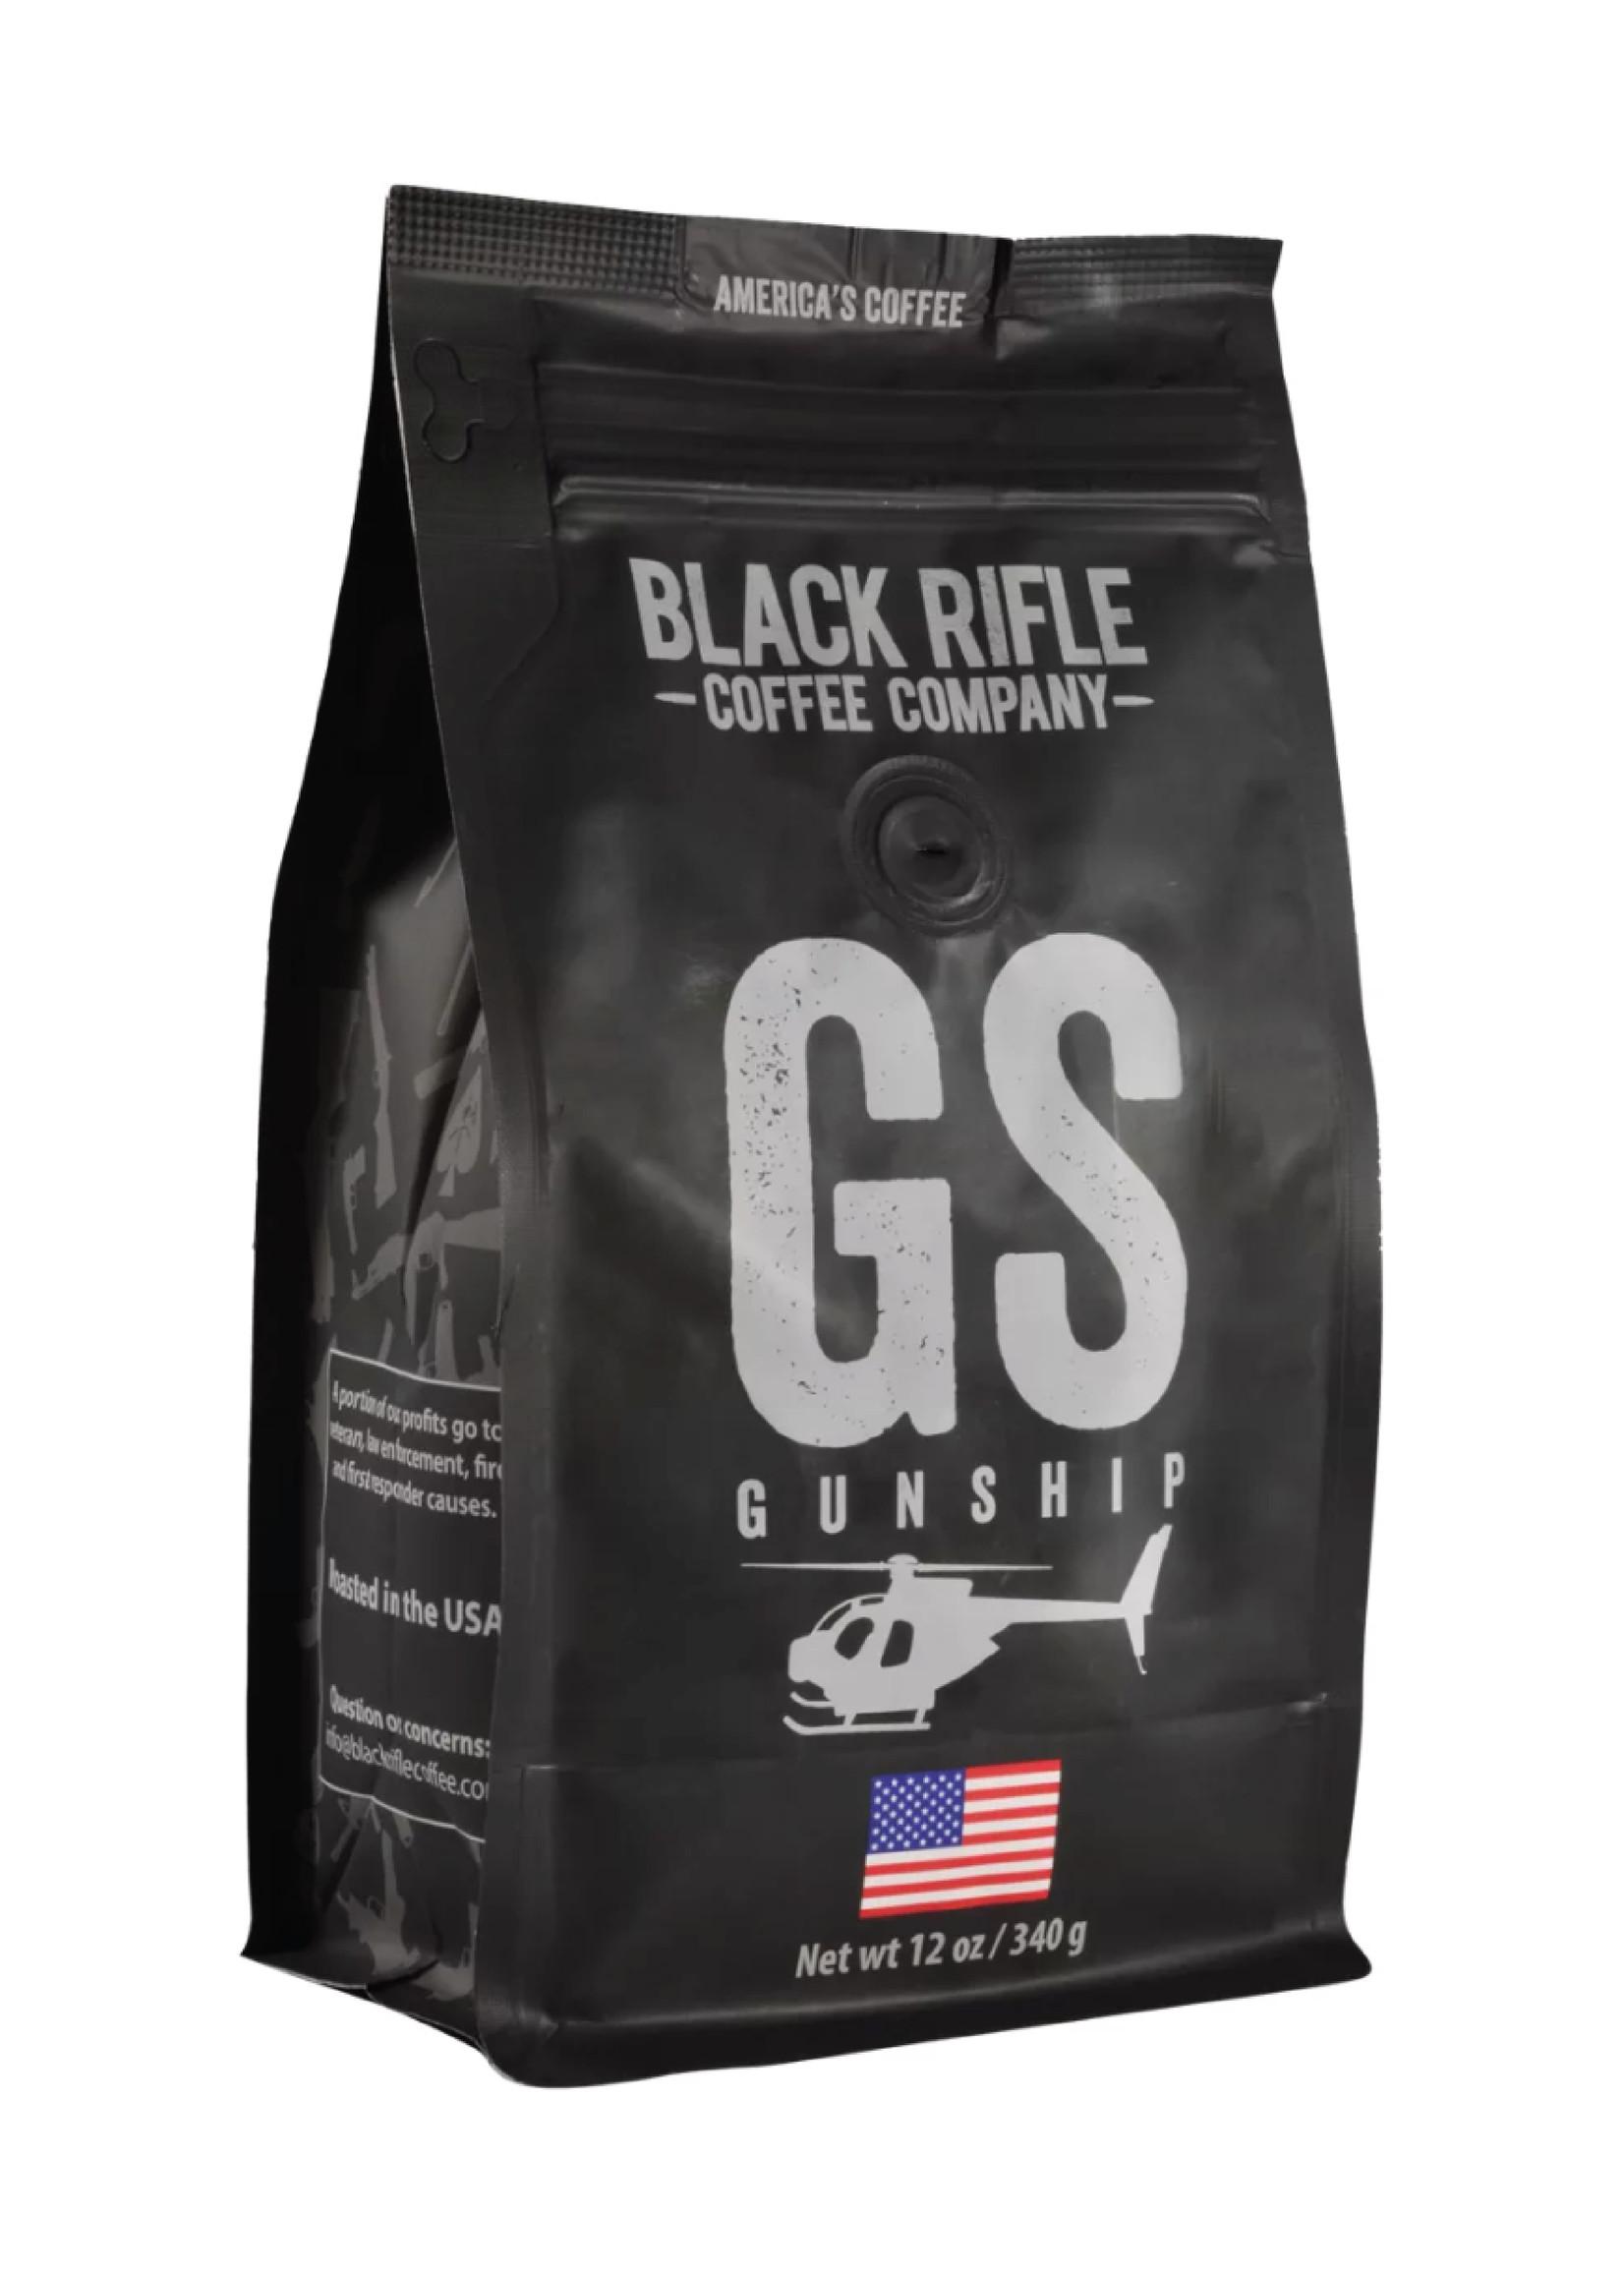 Black Rifle Coffee Company Black Rifle Coffee Company Gunship Coffee Roast Ground